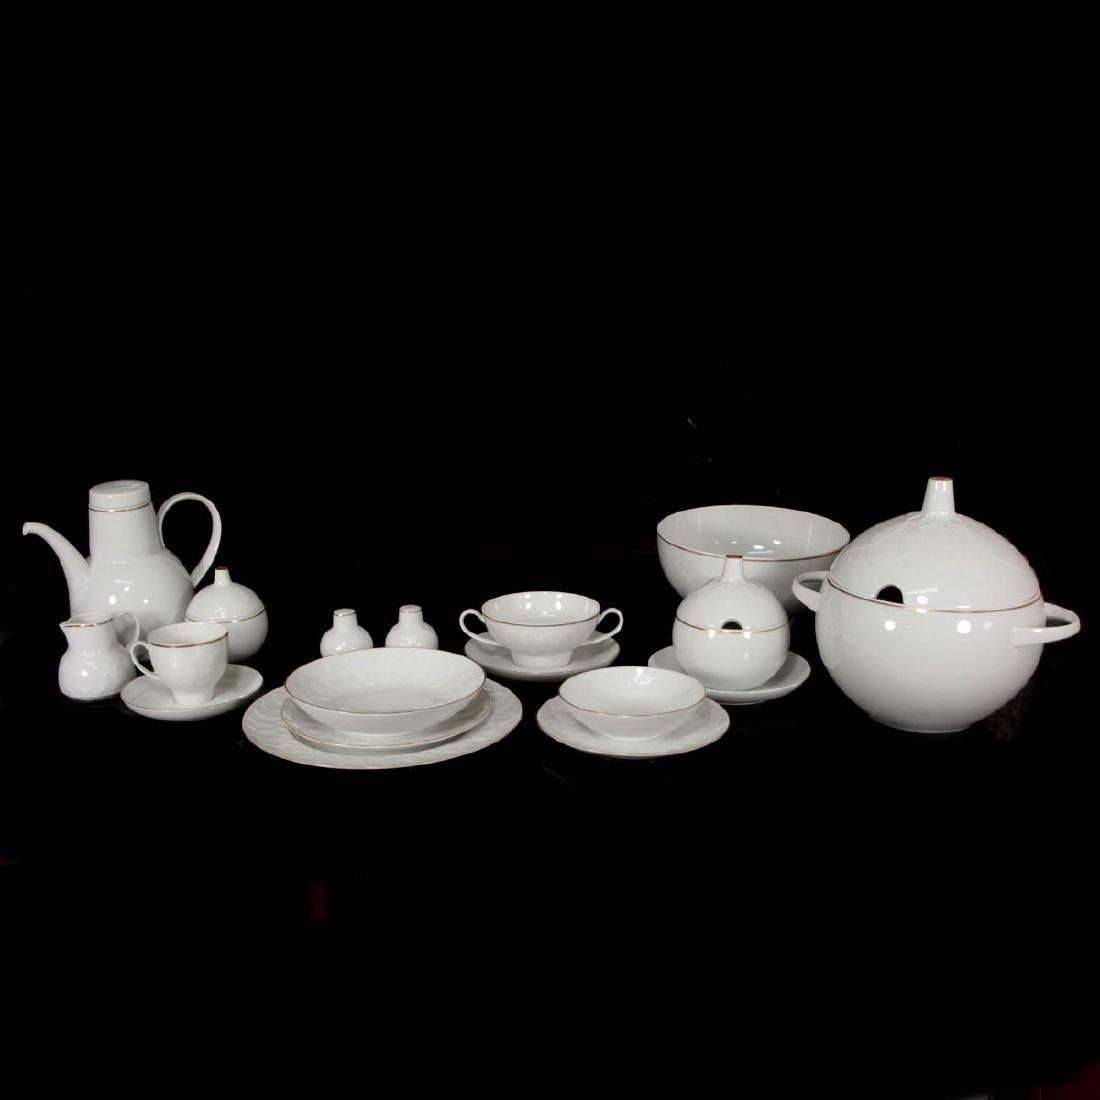 Rosenthal Porcelain - Bjorn Wiinblad - Lotus 79pcs